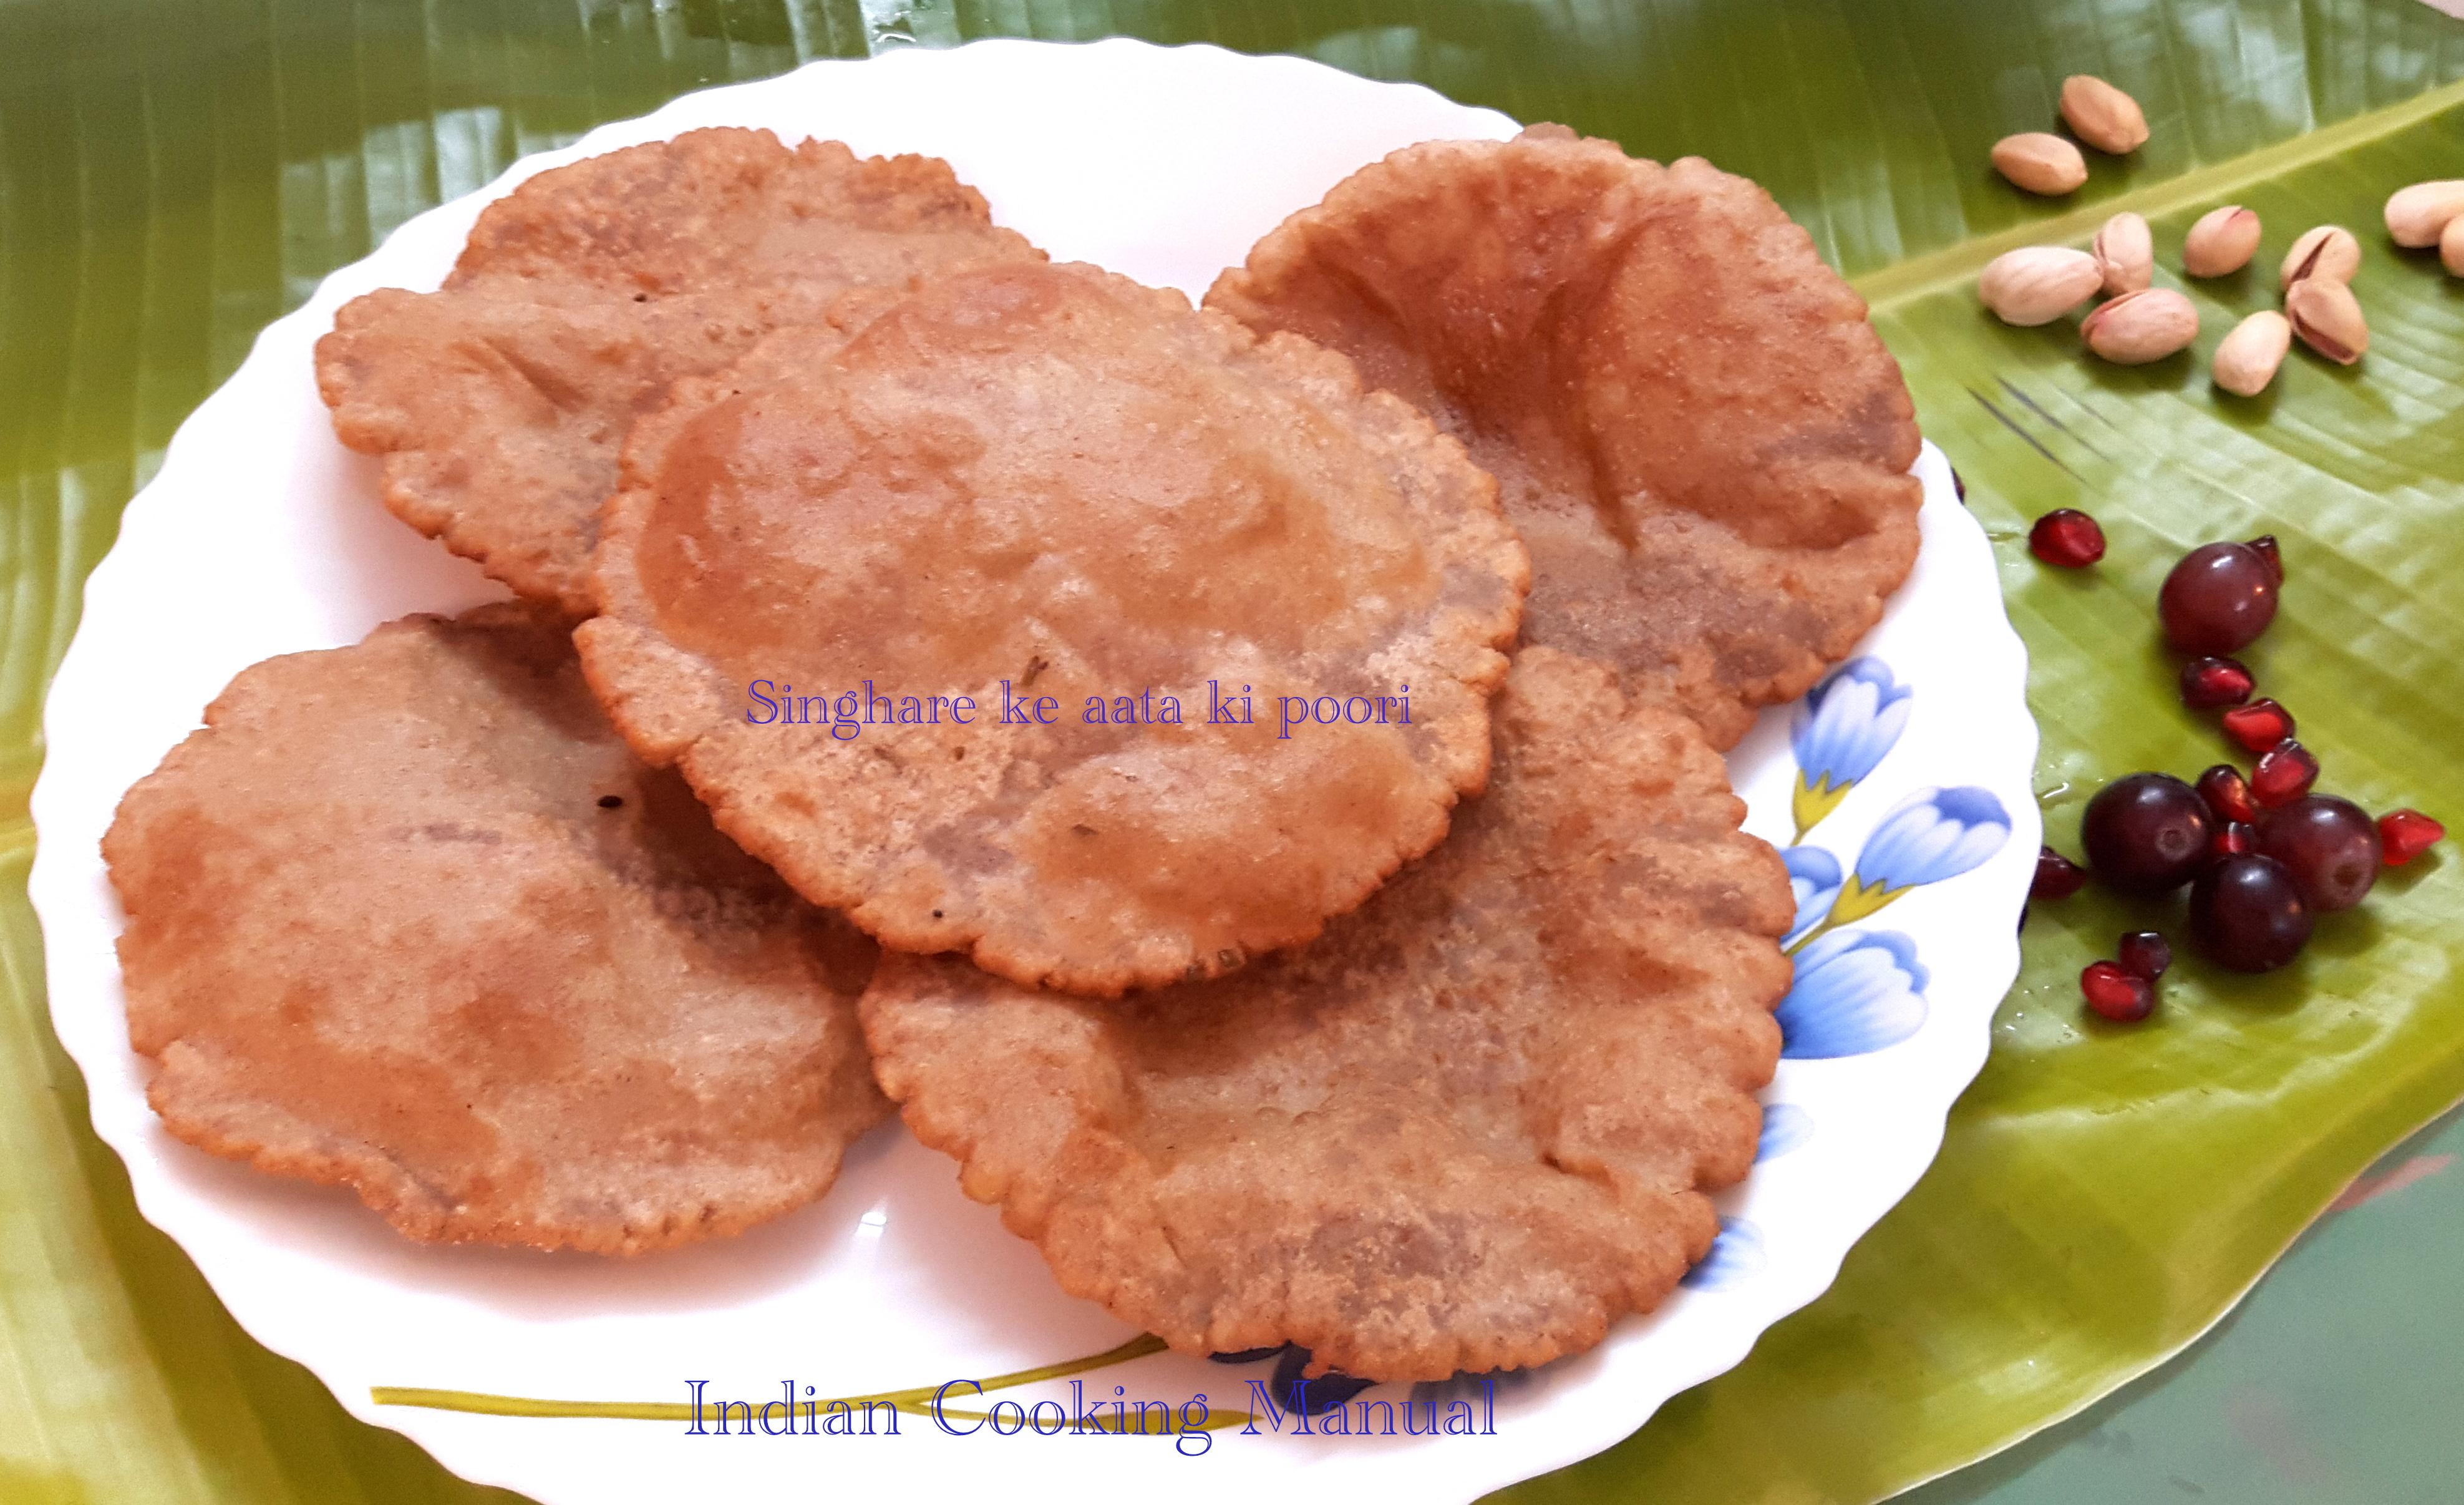 Singhare ke Aate (water chestnut flour) ki poori